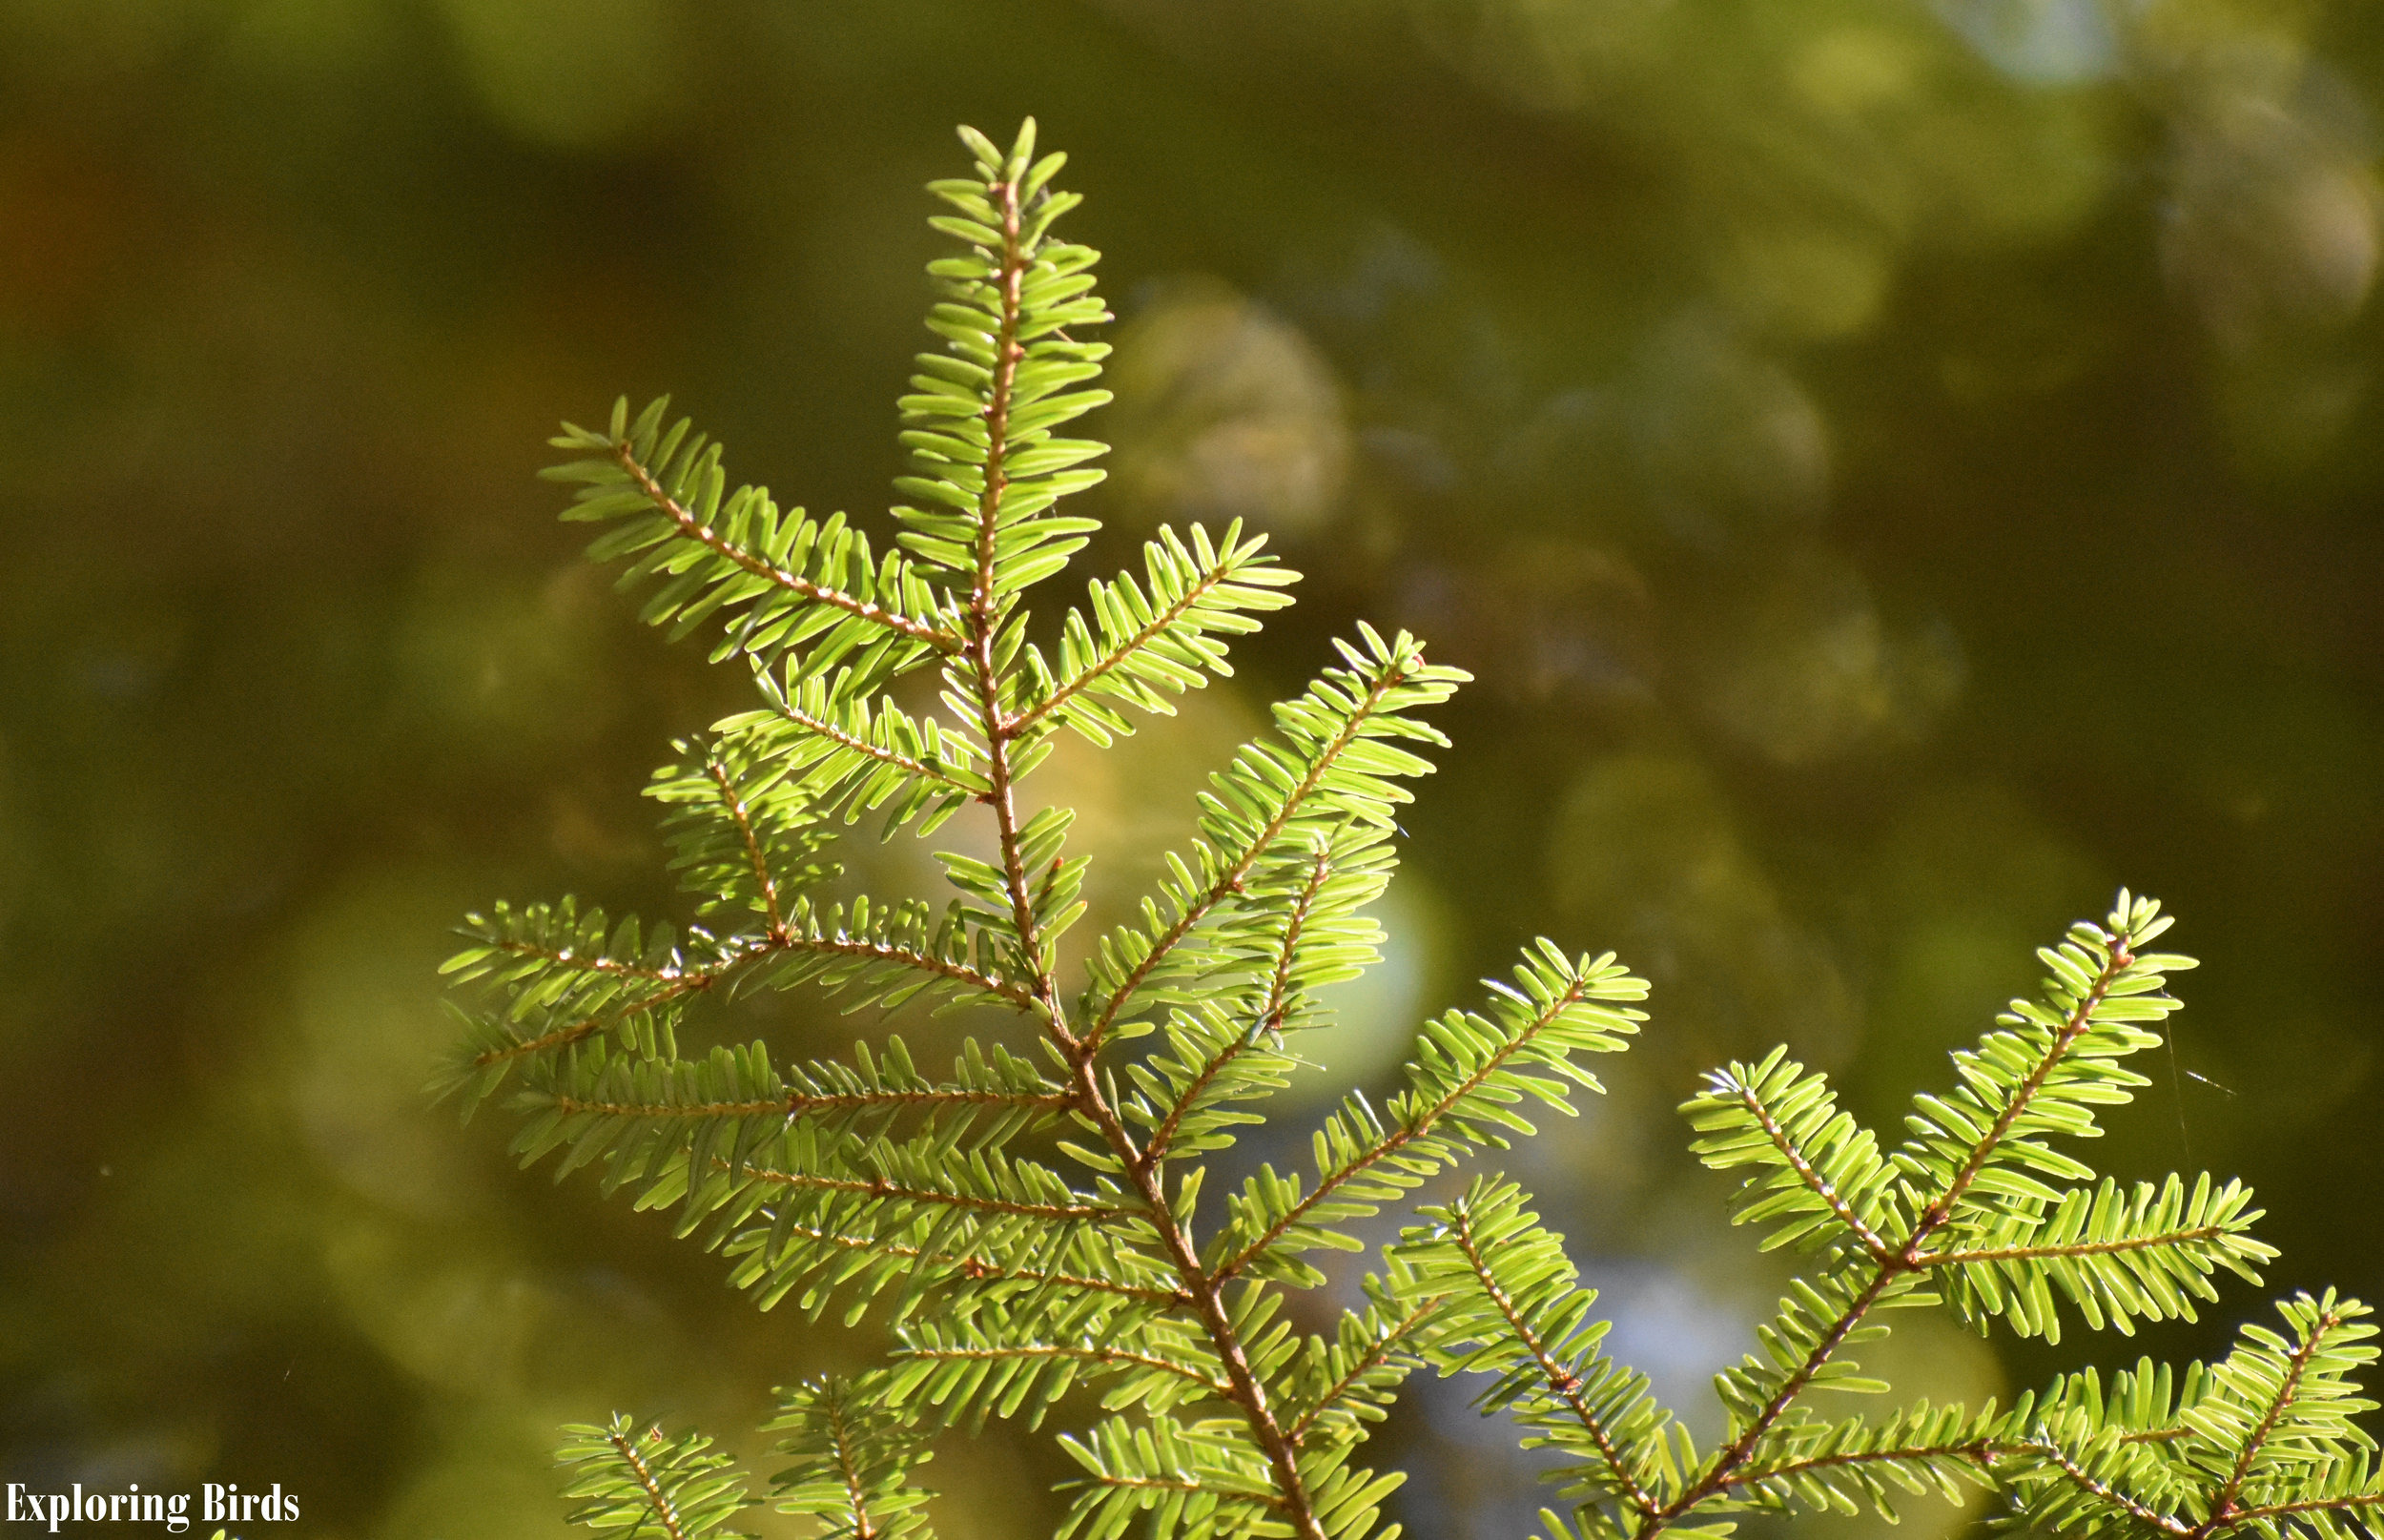 Eastern Hemlock is a tree that attracts birds